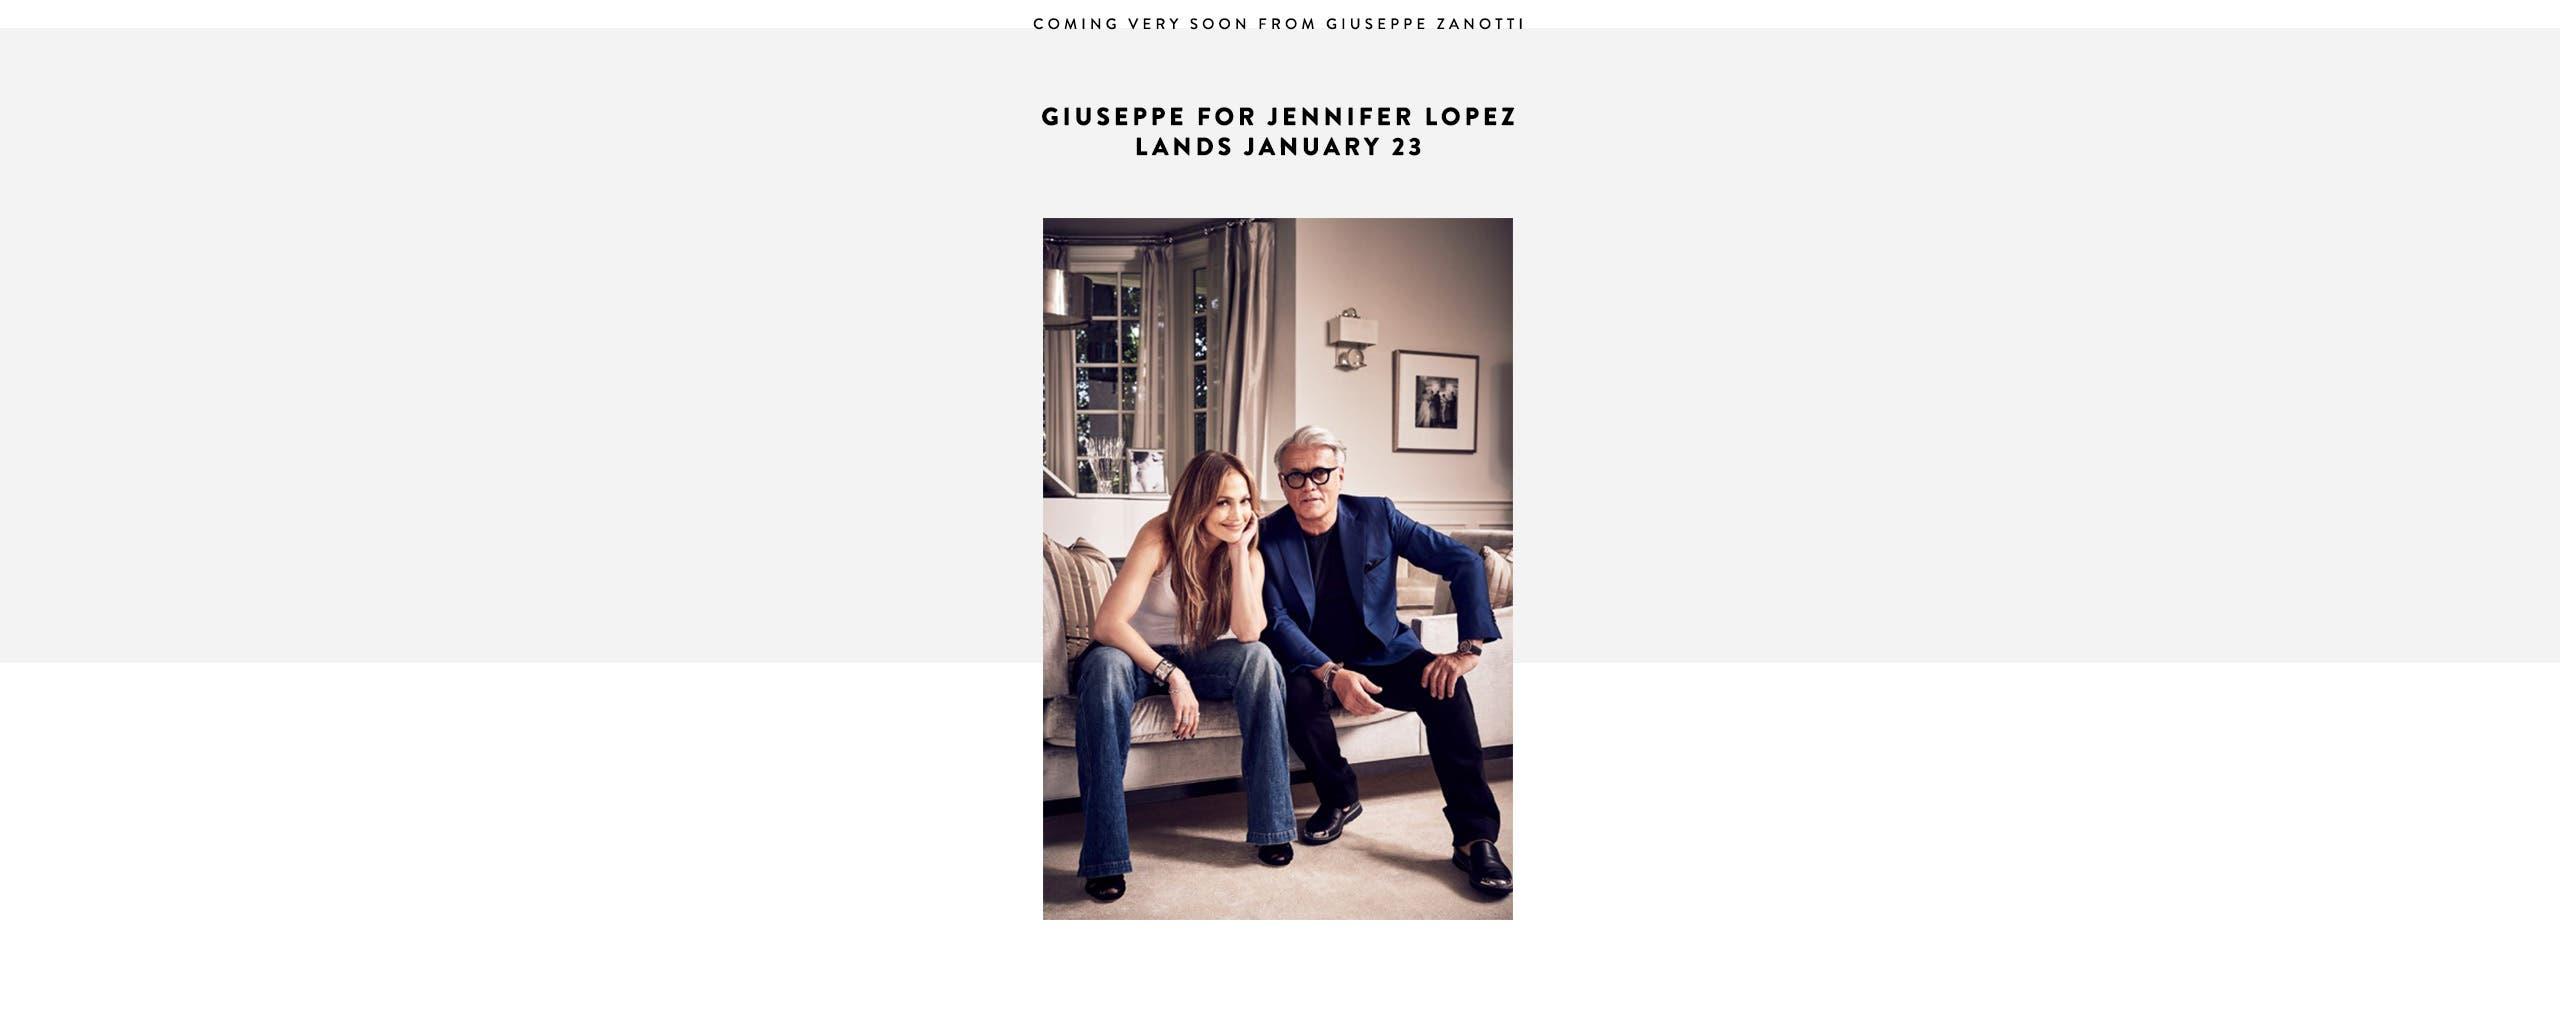 Coming soon: Giuseppe Zanotti x Jennifer Lopez shoe collection.